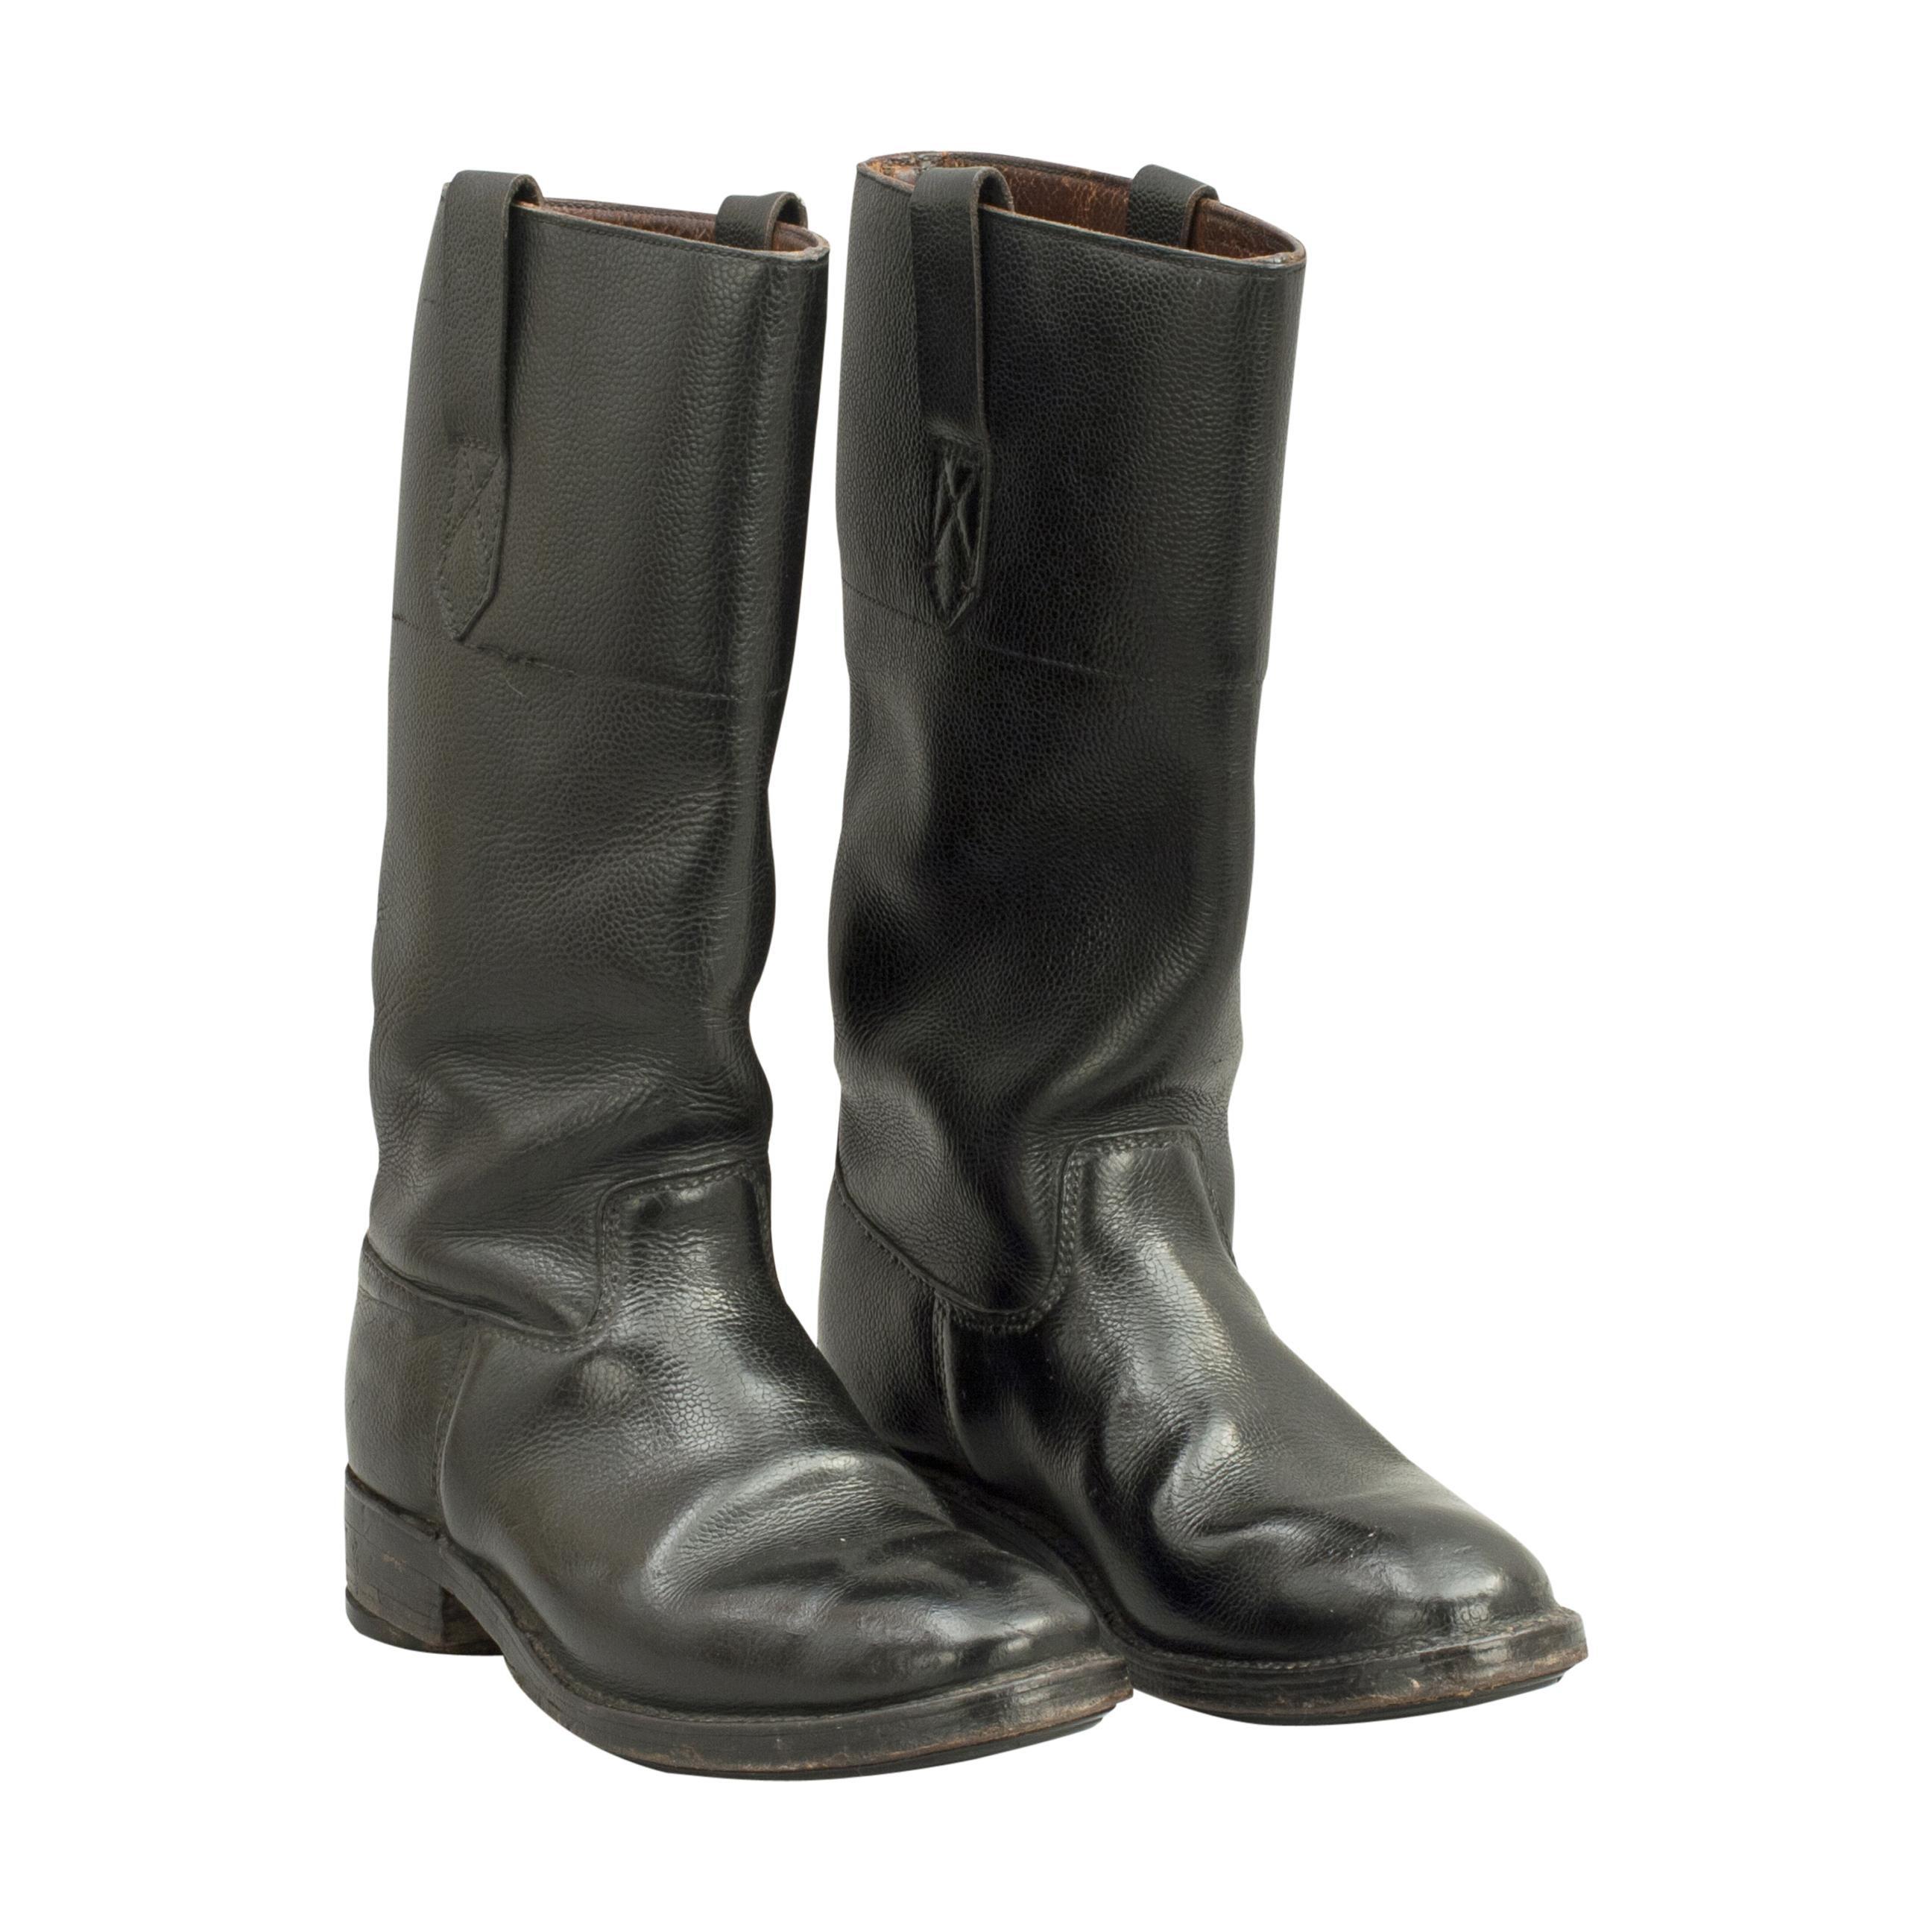 Adam Bros. Ltd. Leather Motorcycle Boots